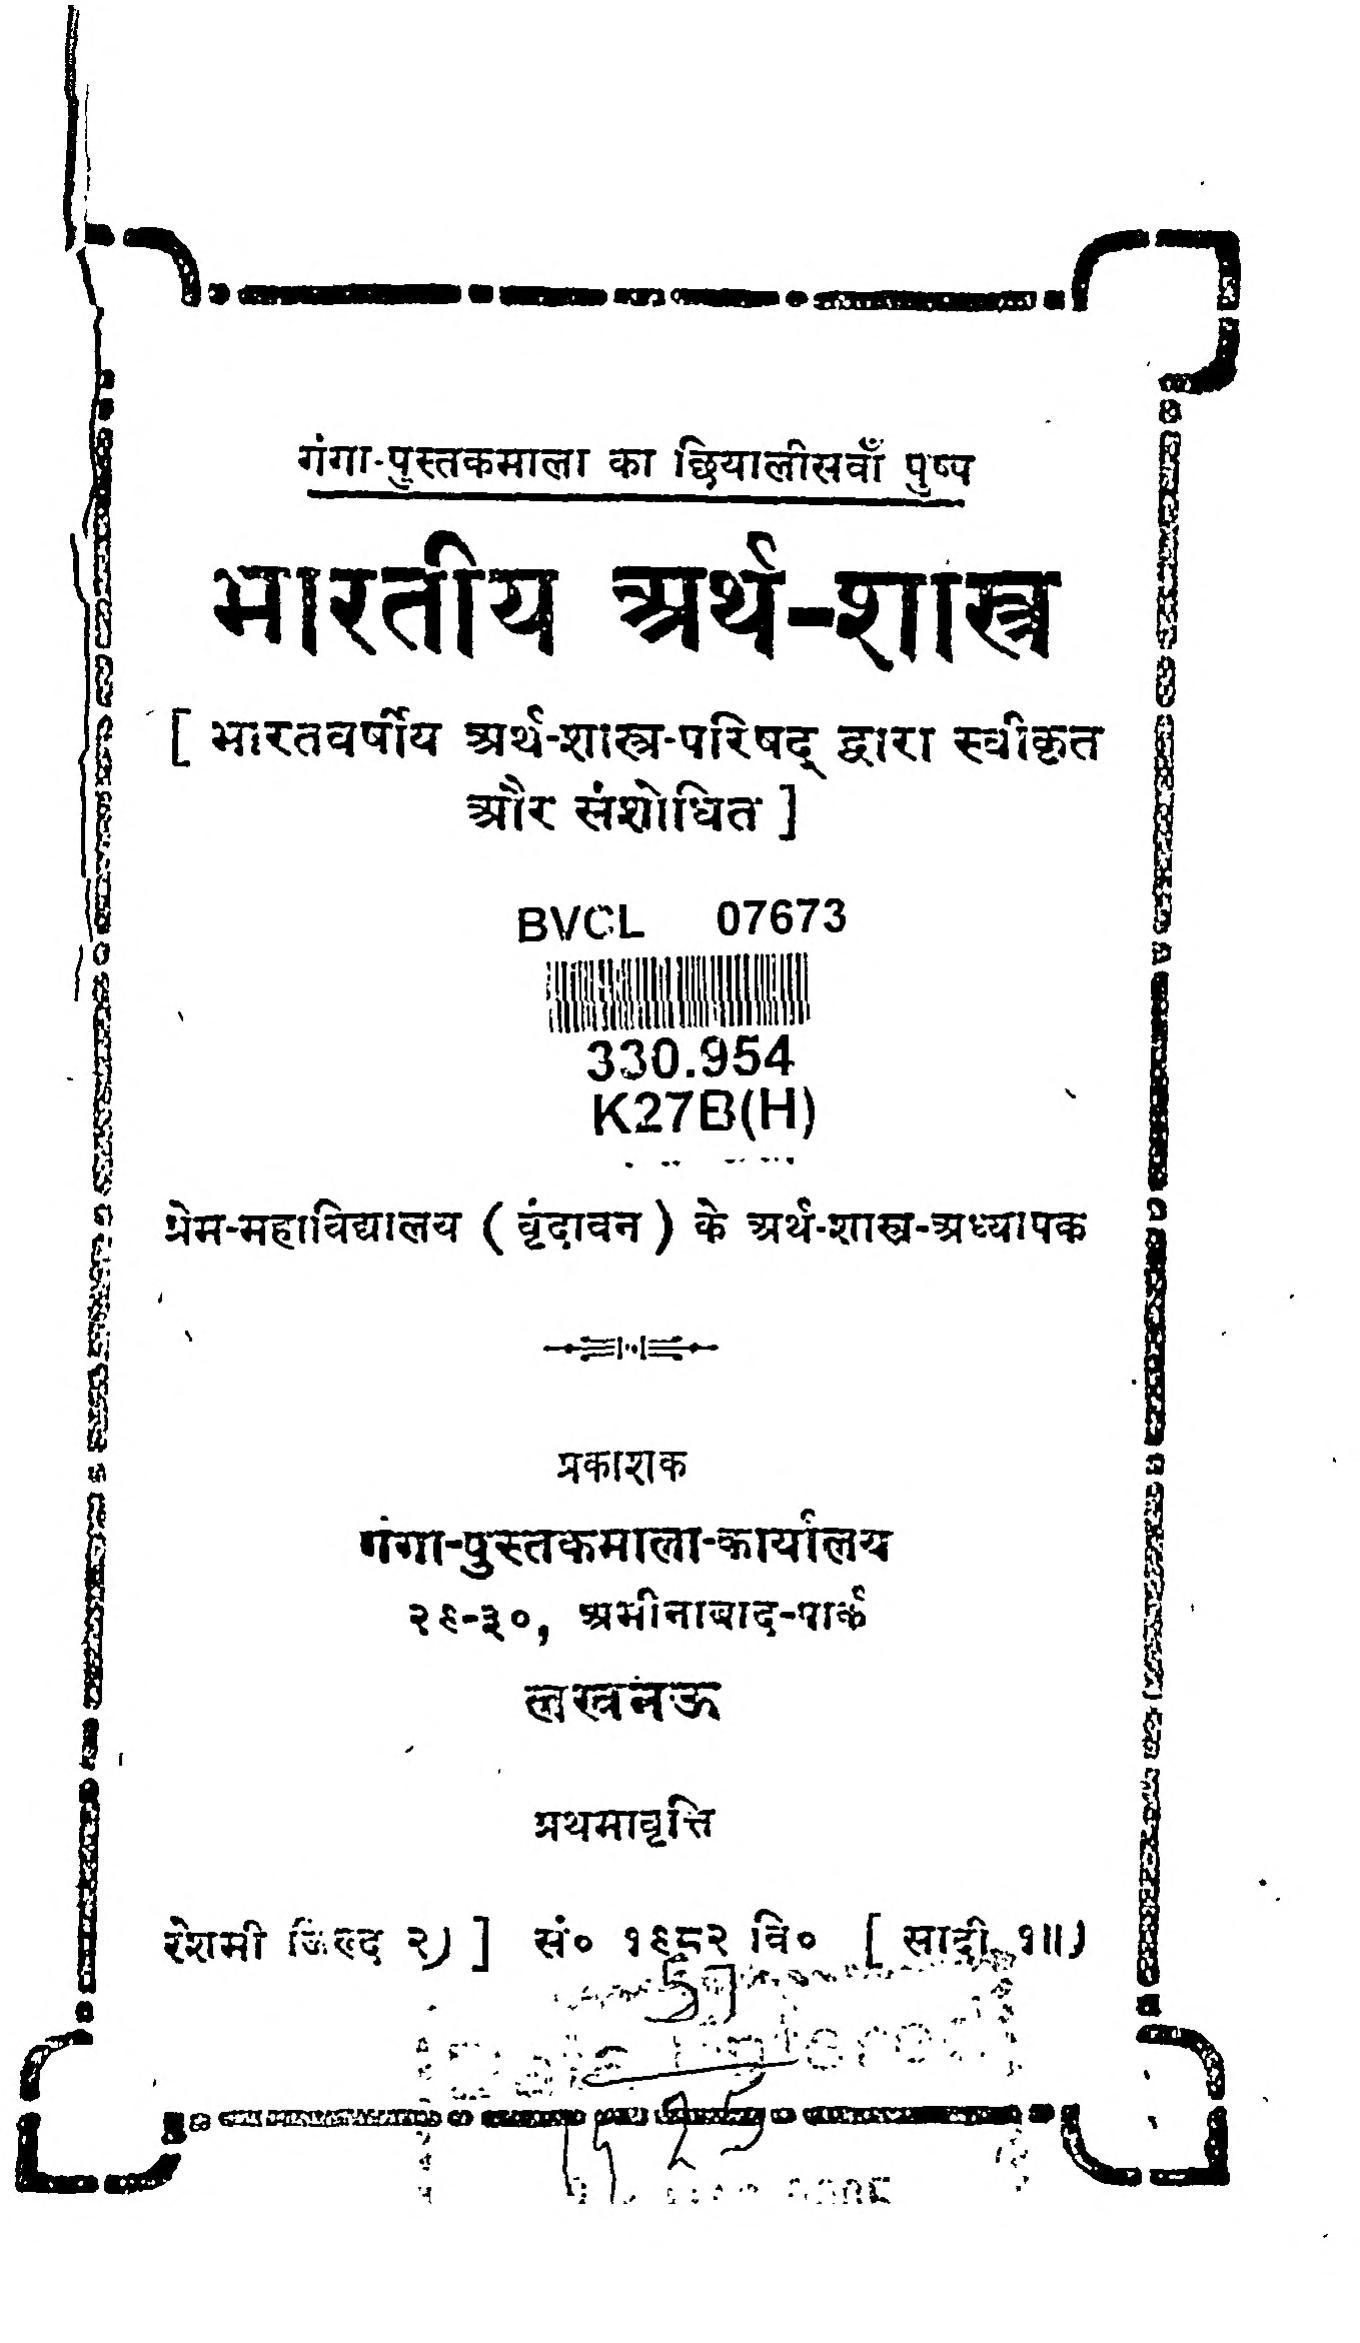 Book Image : भारतीय अर्थ शास्त्र भाग 1 - Bhartiya Arth Shastra Bhag 1